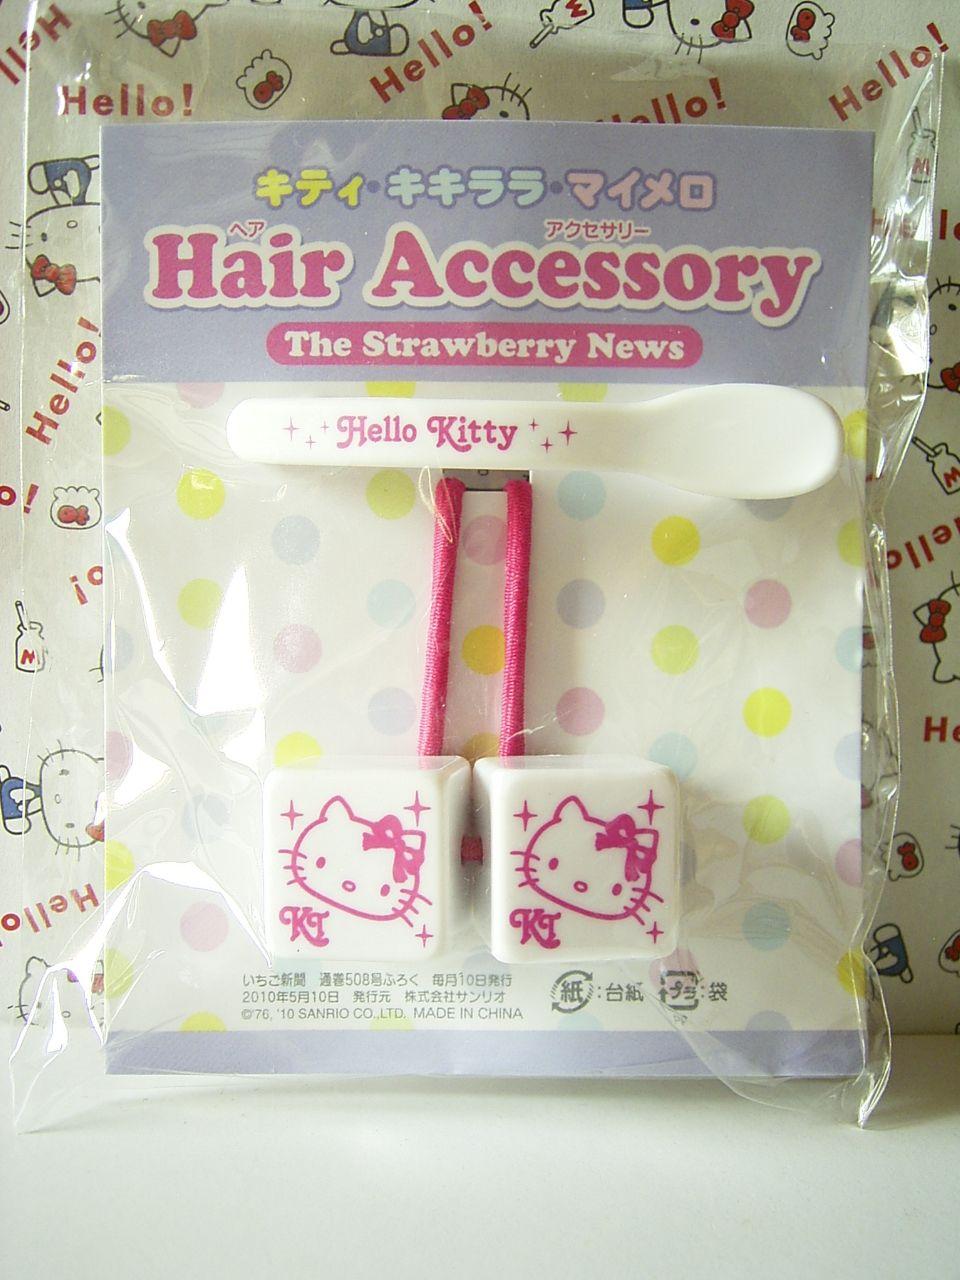 HELLO KITTY Sanrio JAPAN Strawberry News Paper Ichigo Shinbun Hair Accessory